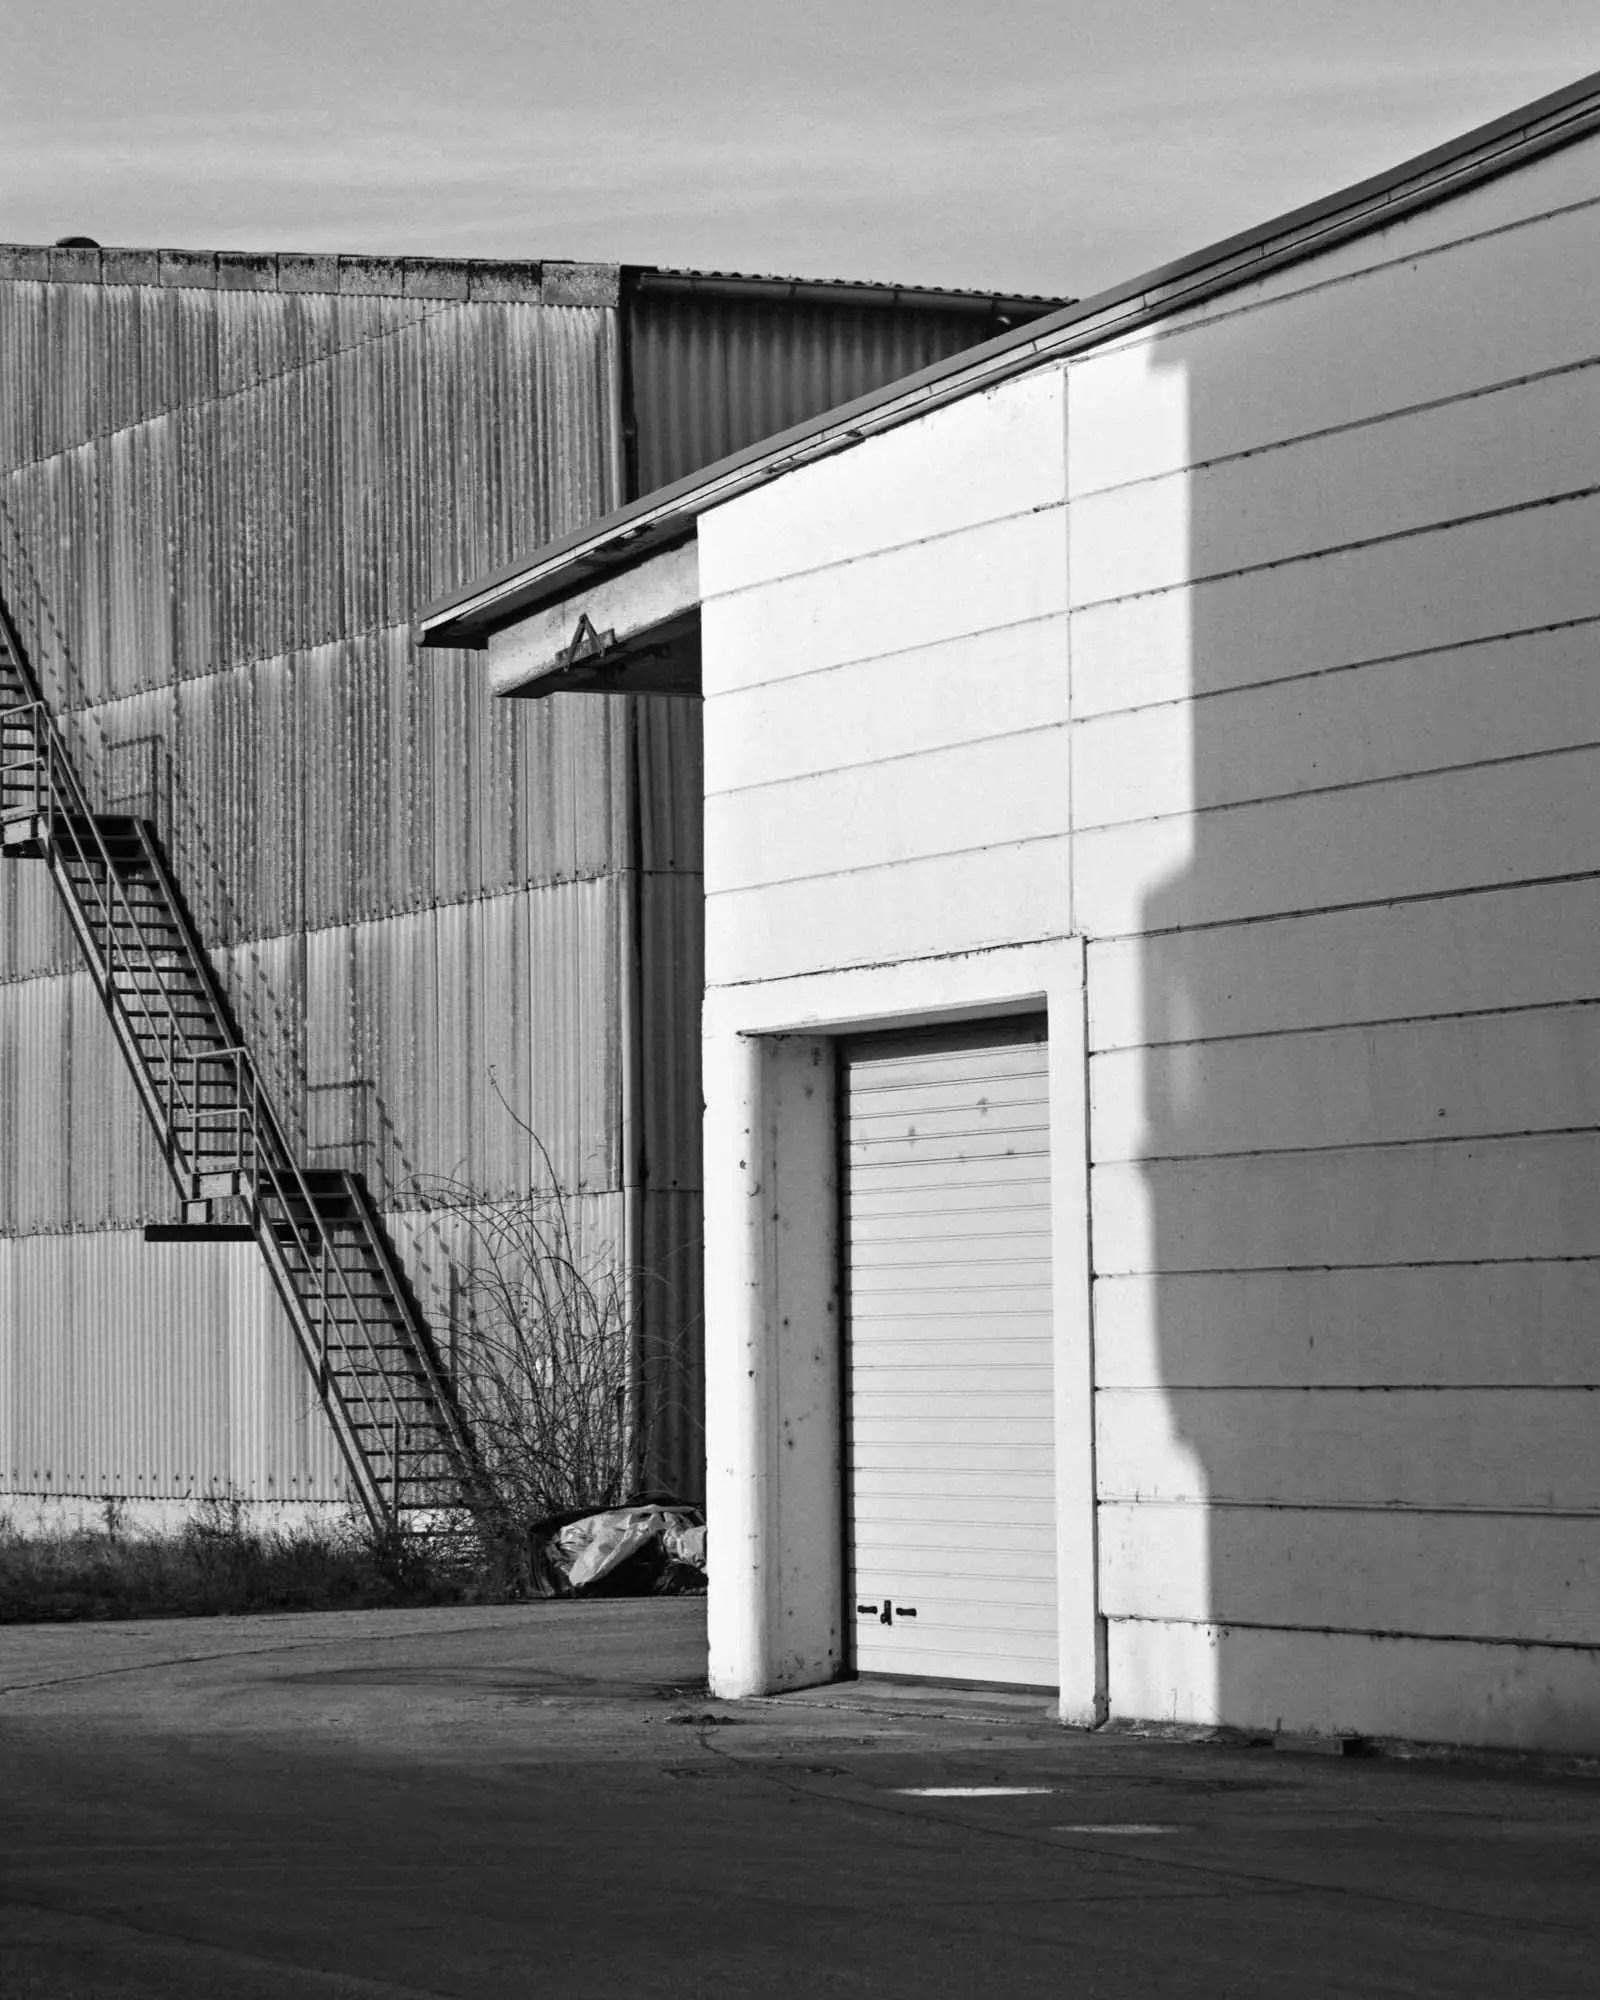 Warehouse architecture - M6, Summicron-M 50mm, Adox HR-50